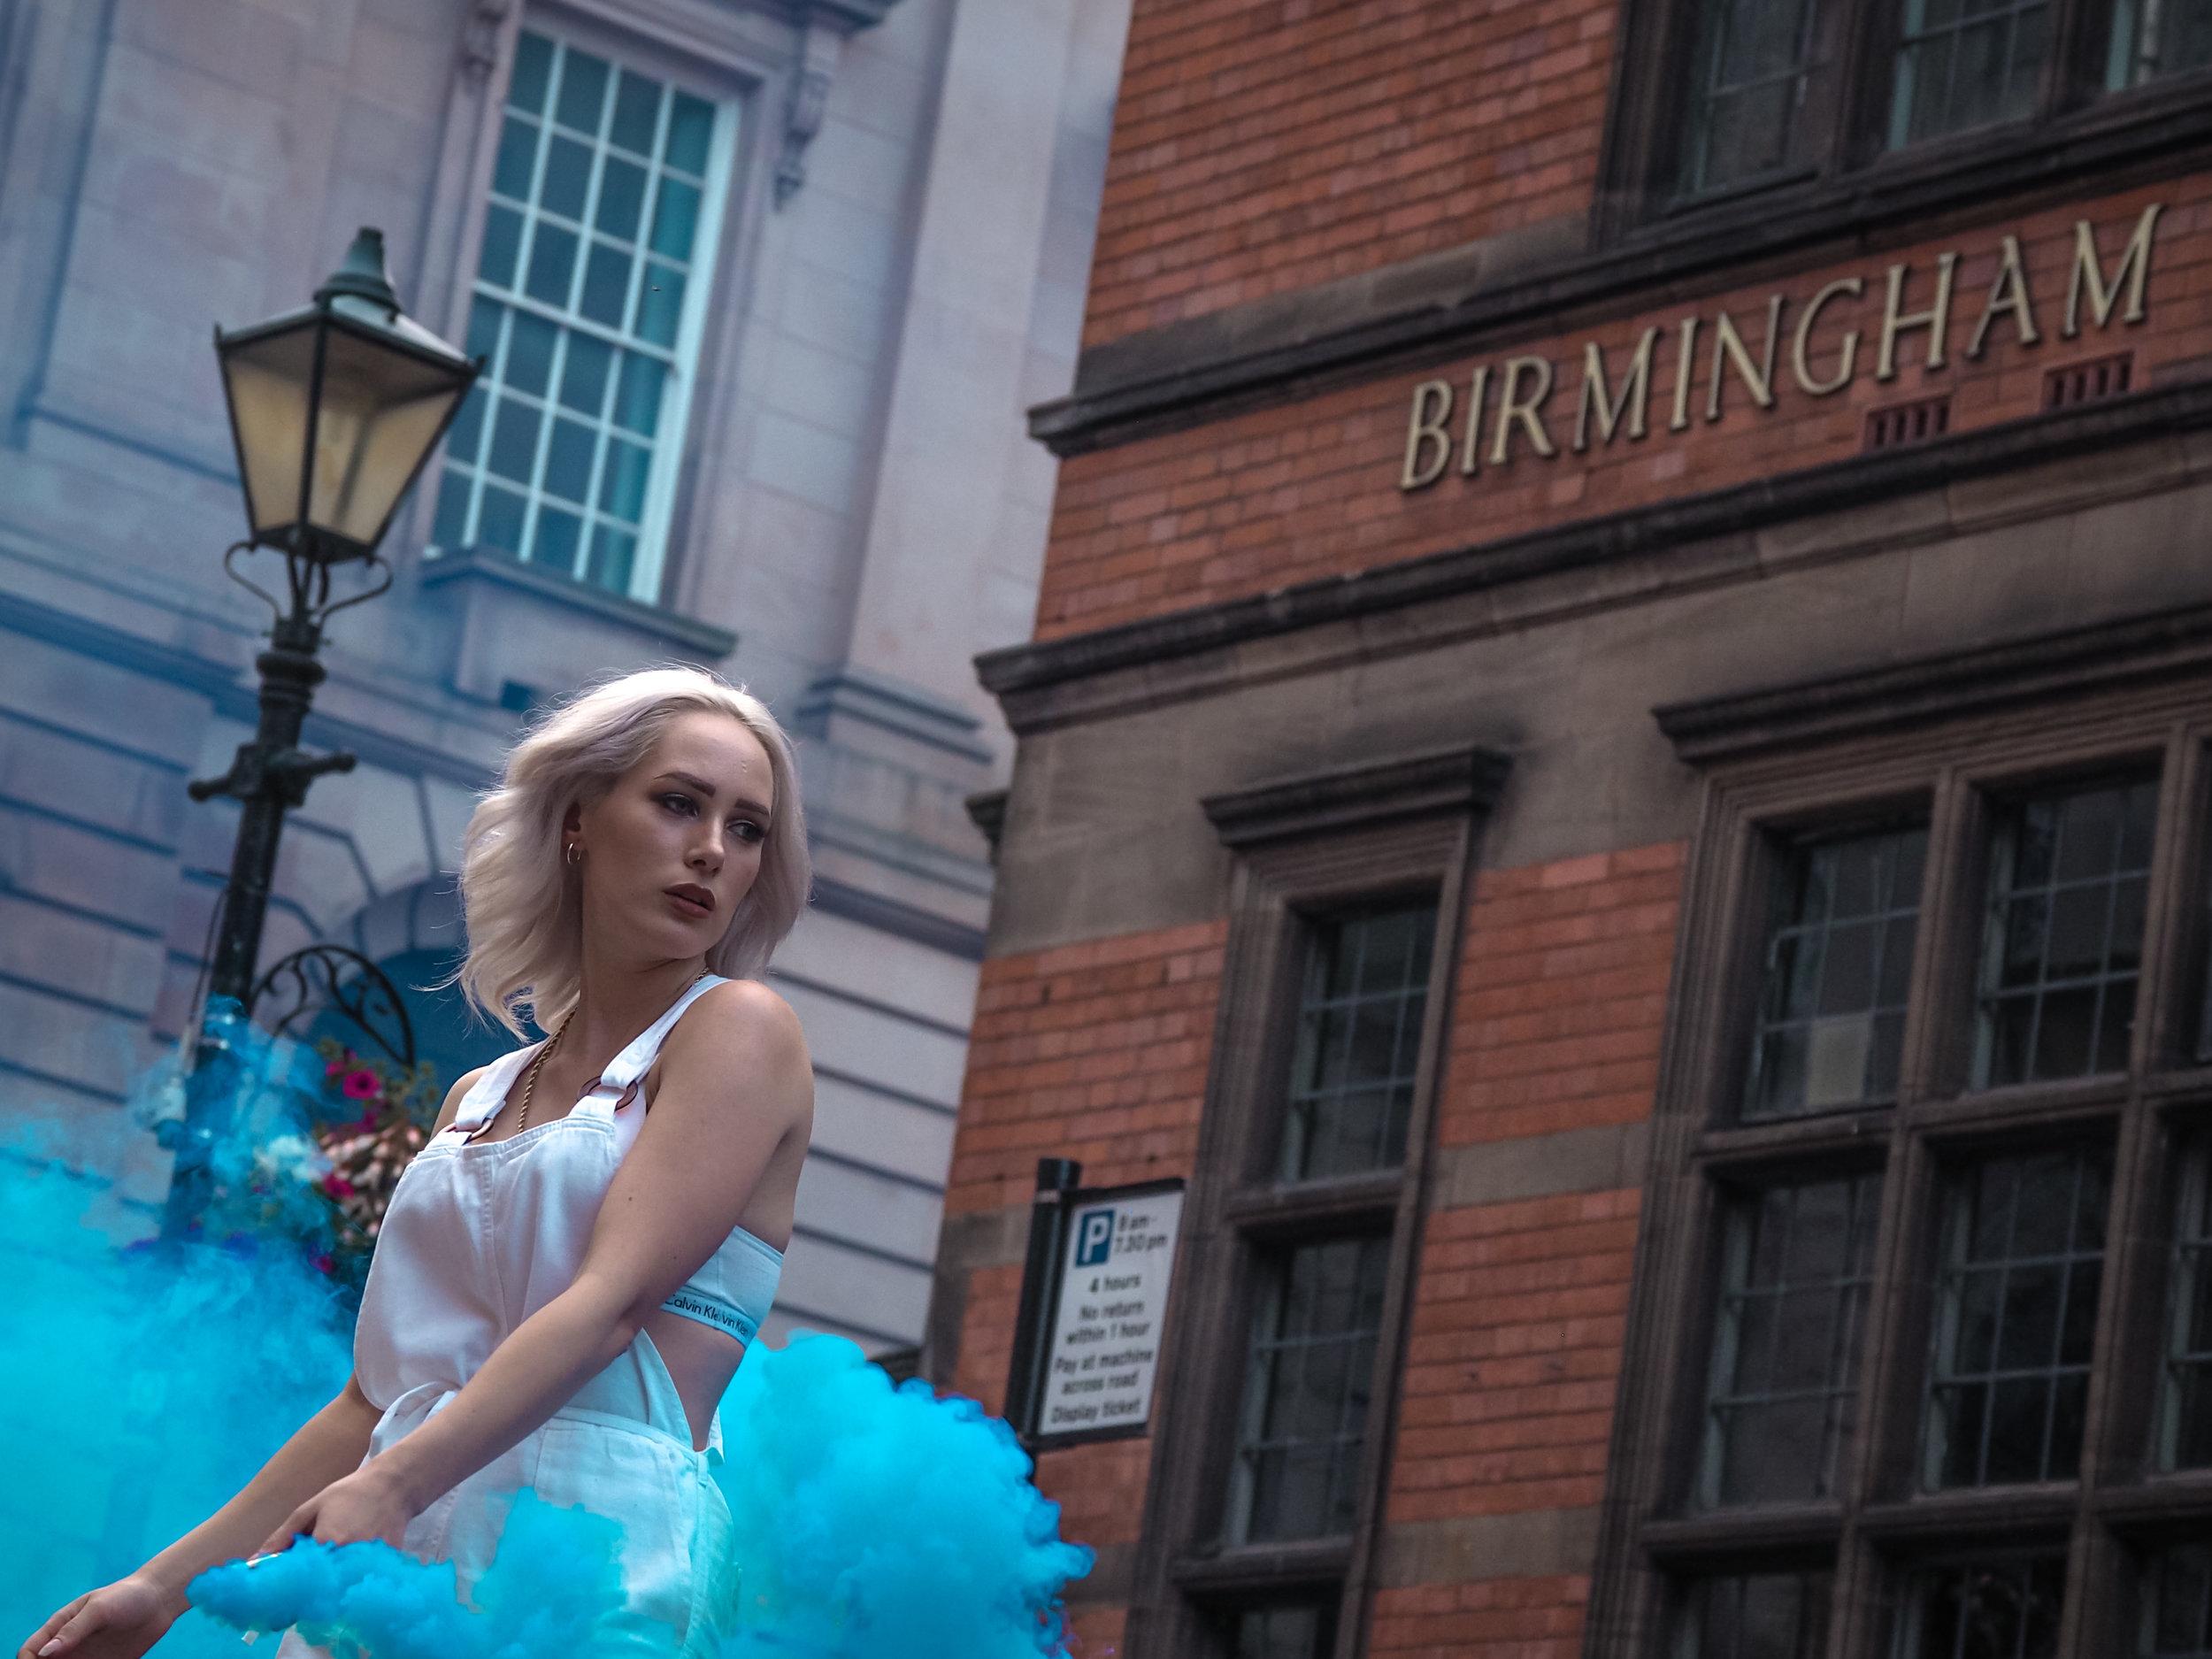 UKS_FORTHECREATORS - Birmingham